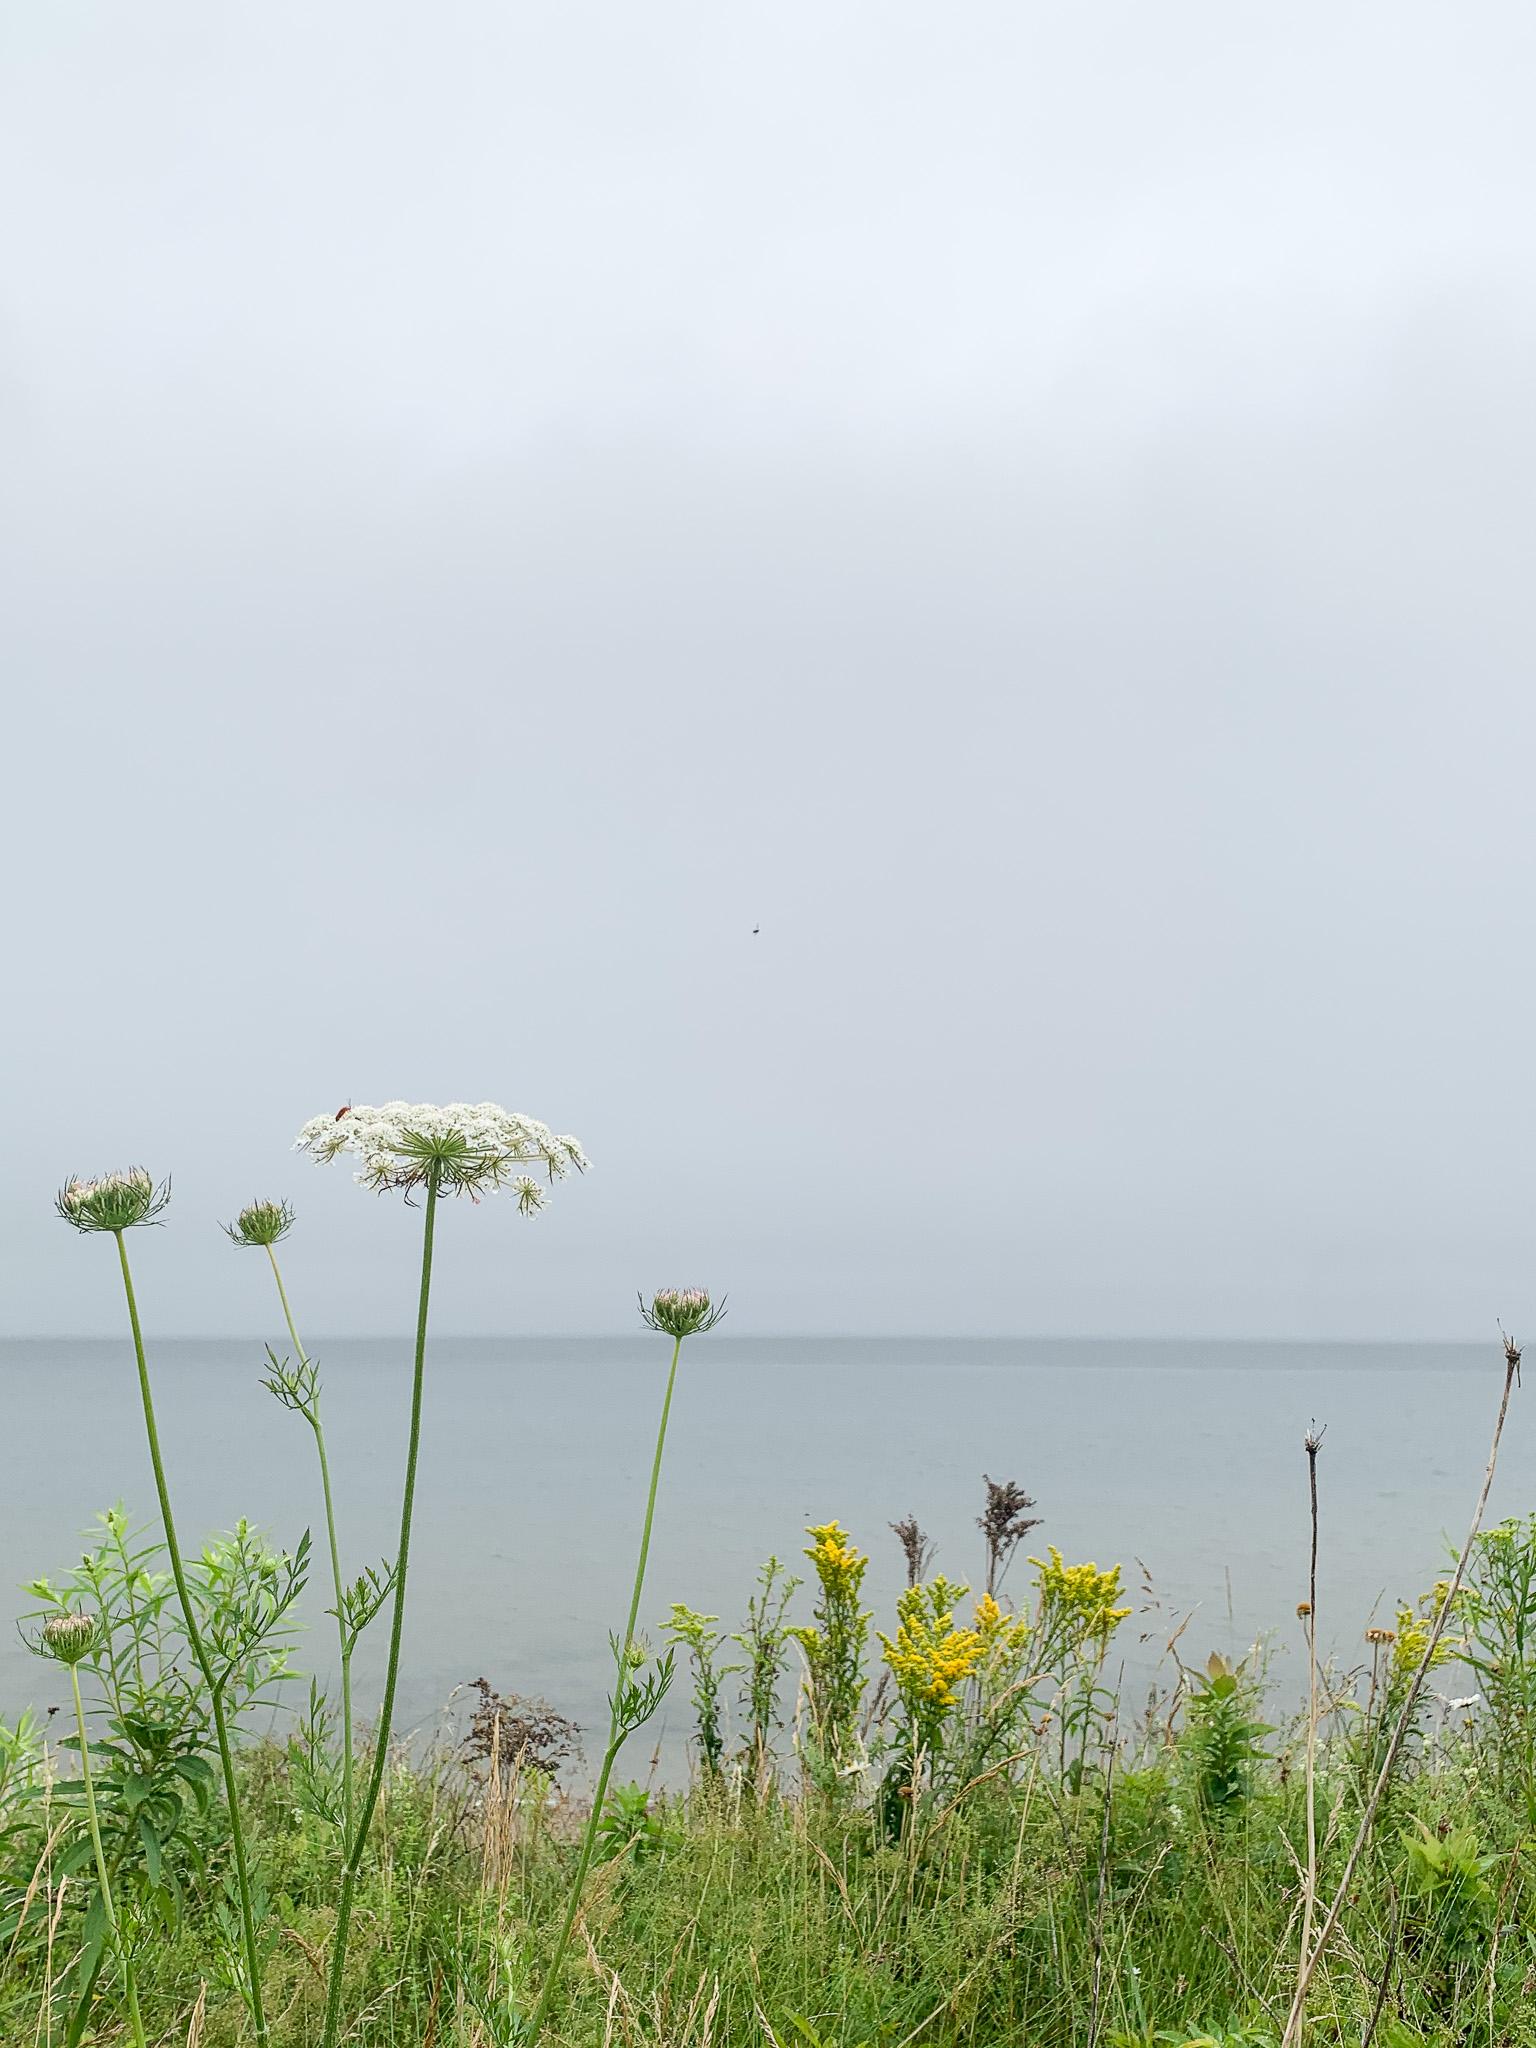 The Northumberland Strait